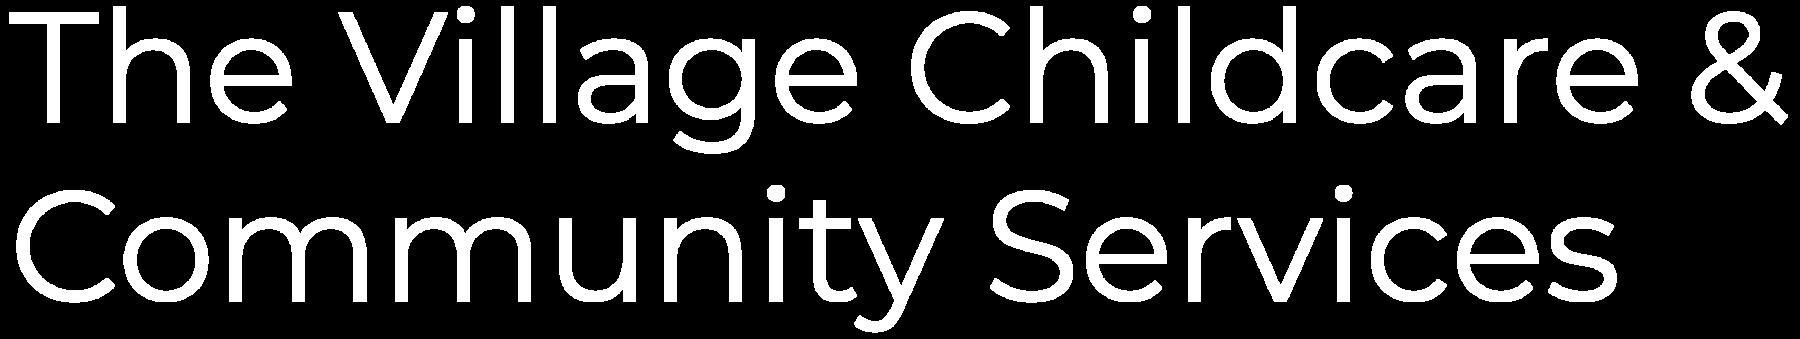 The Village Childcare & Community Services